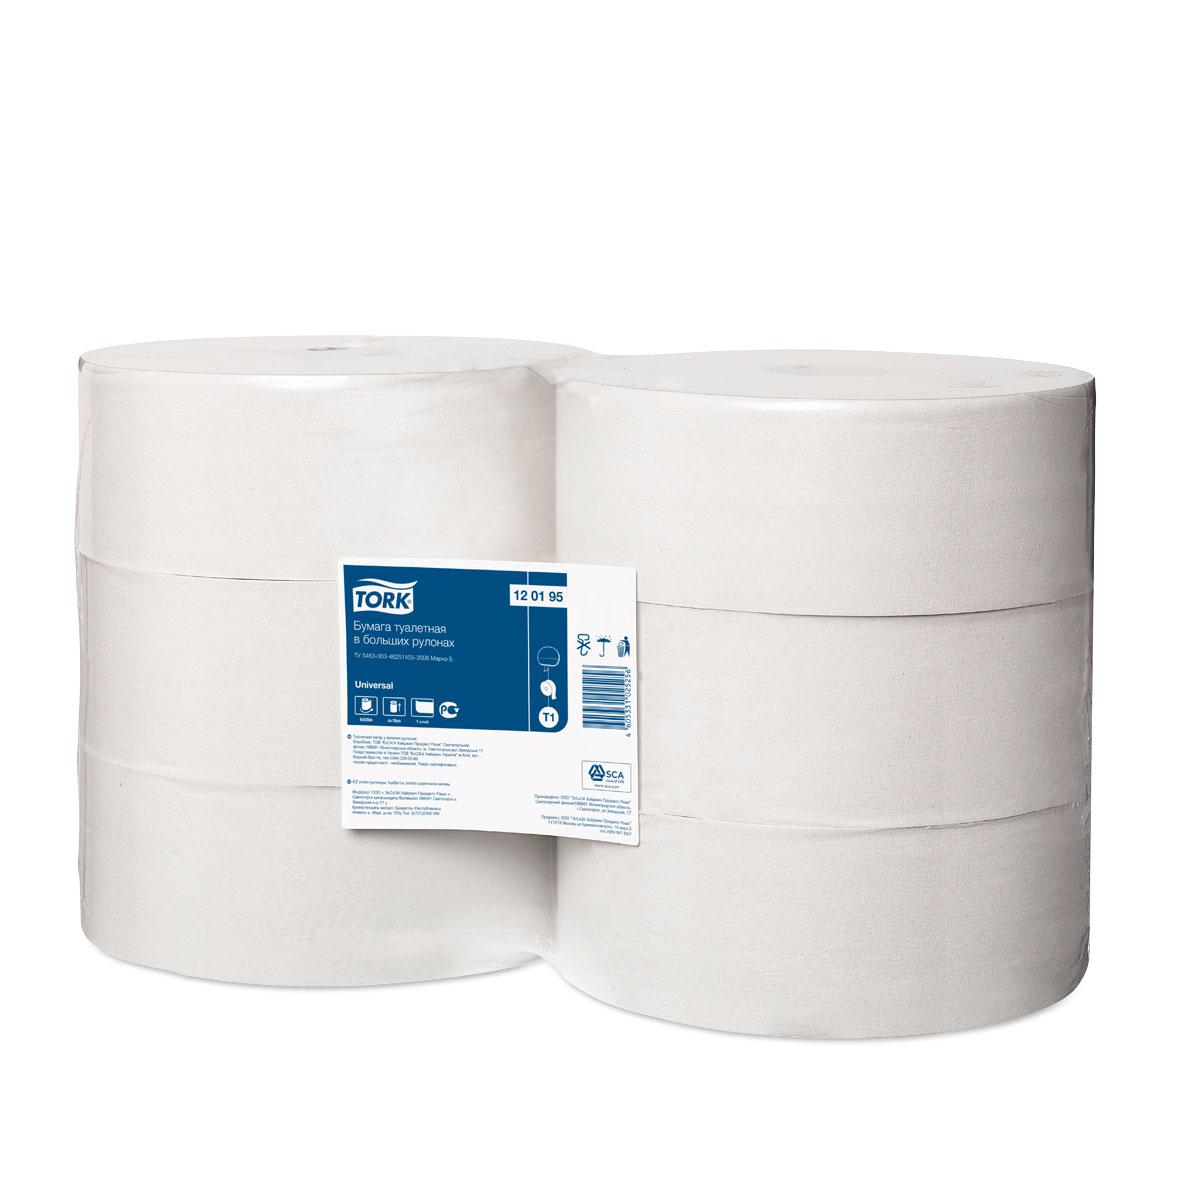 Tork туалетная бумага в больших рулонах 1-сл 525м, коробка 6 шт120095Целлюлоза